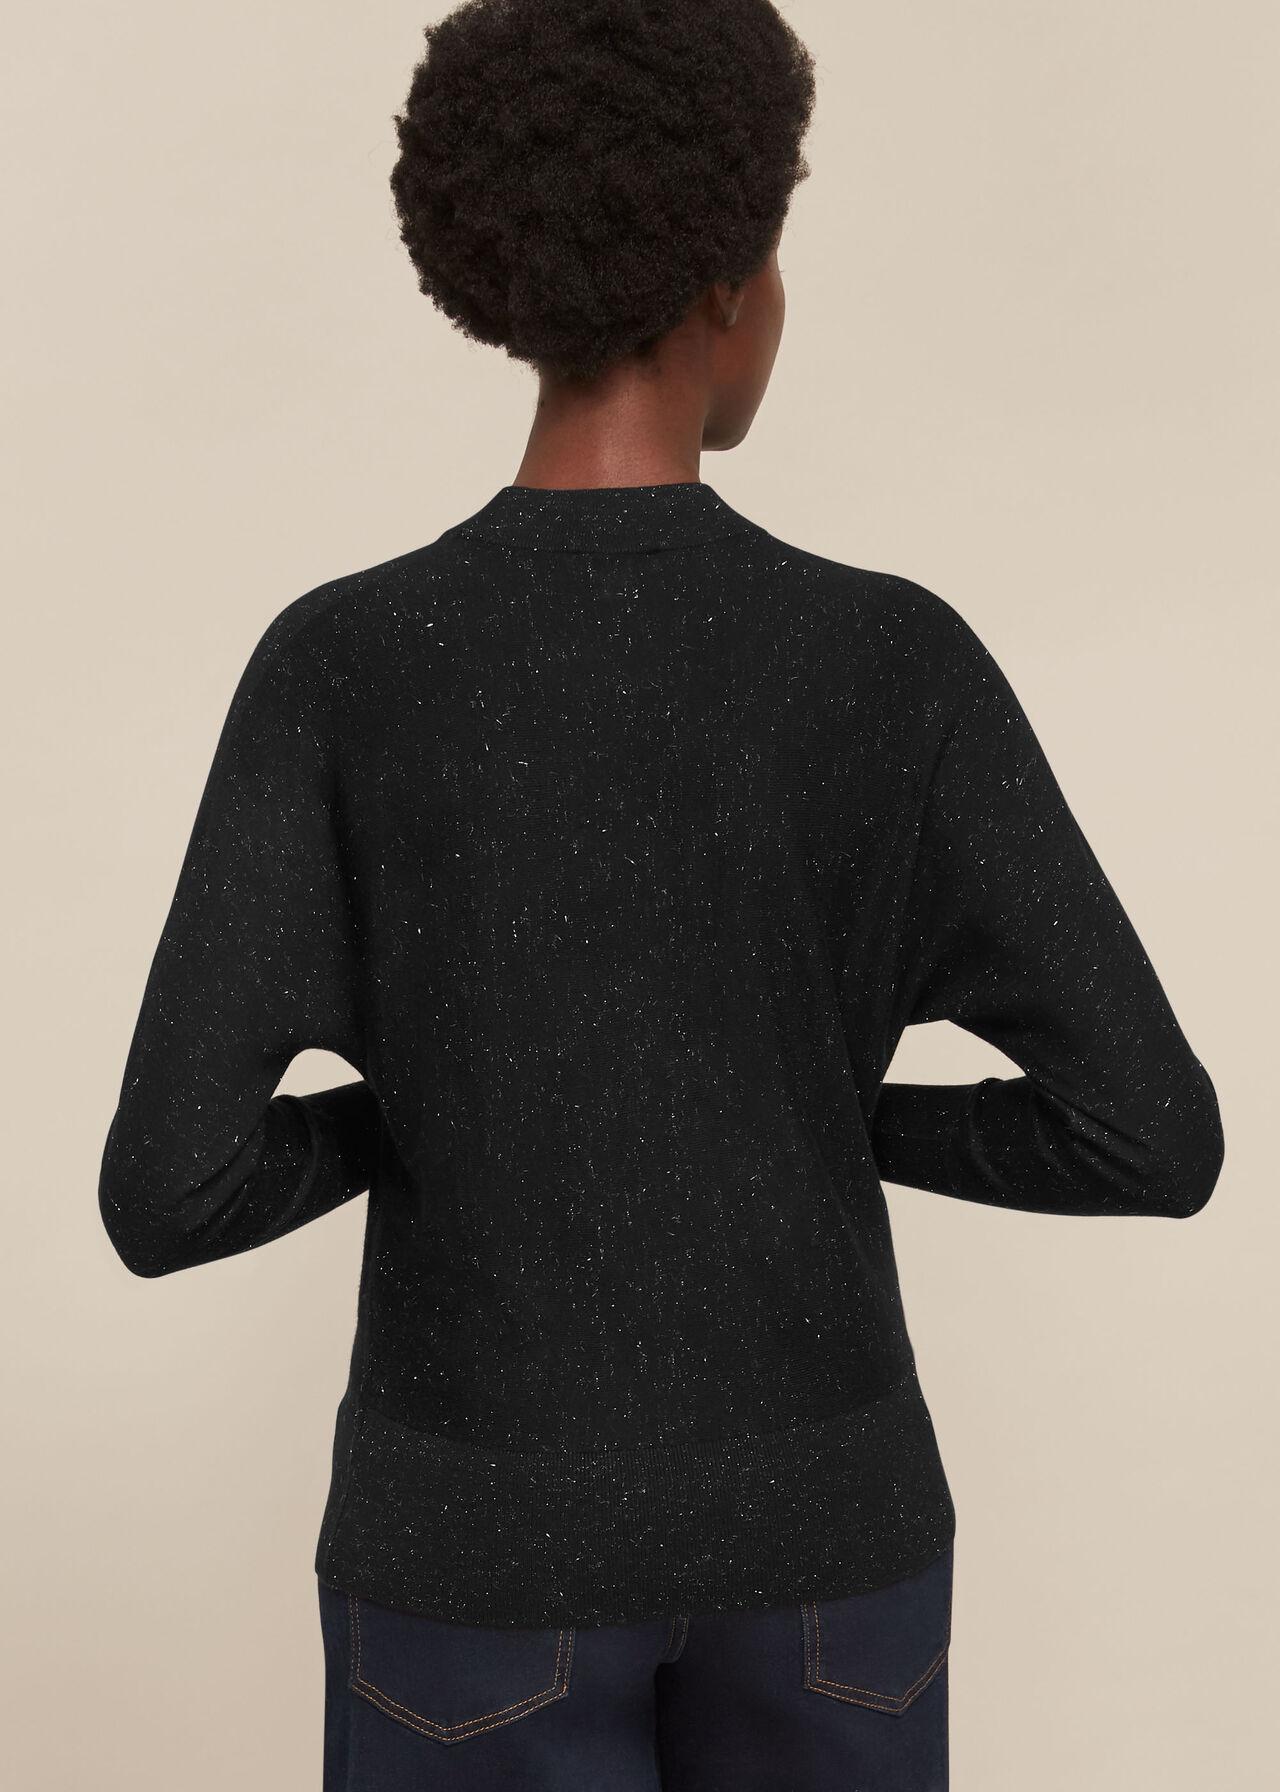 Annie Sparkle Dolman Knit